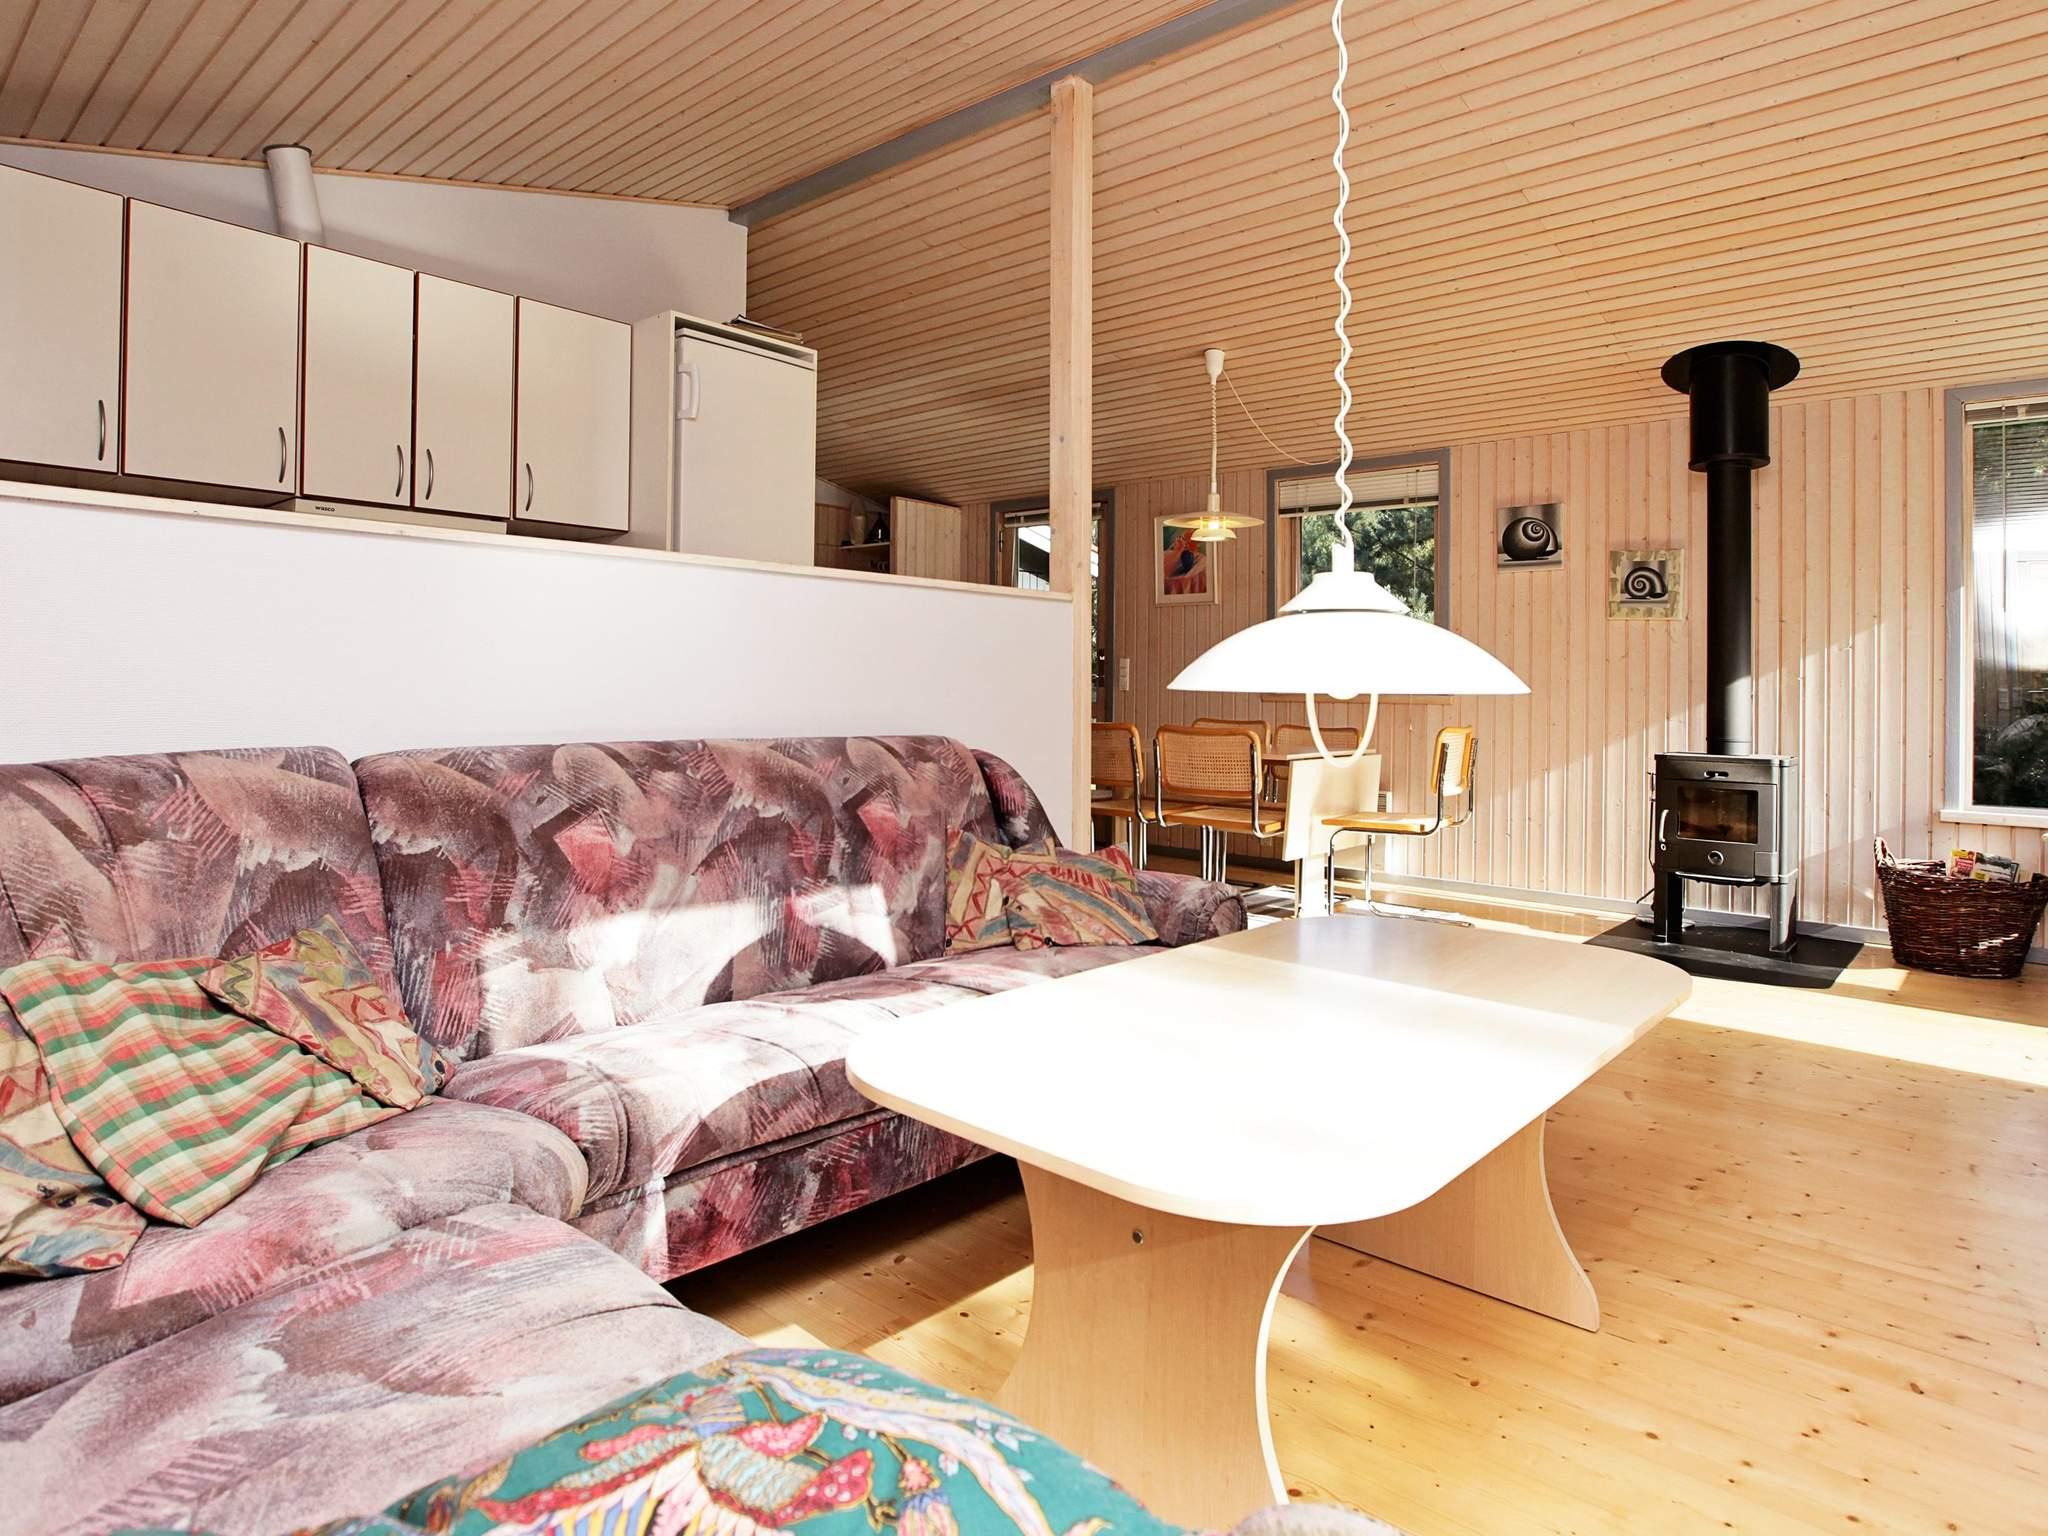 Ferienhaus Overby Lyng (93506), Nykøbing Sj, , Westseeland, Dänemark, Bild 9